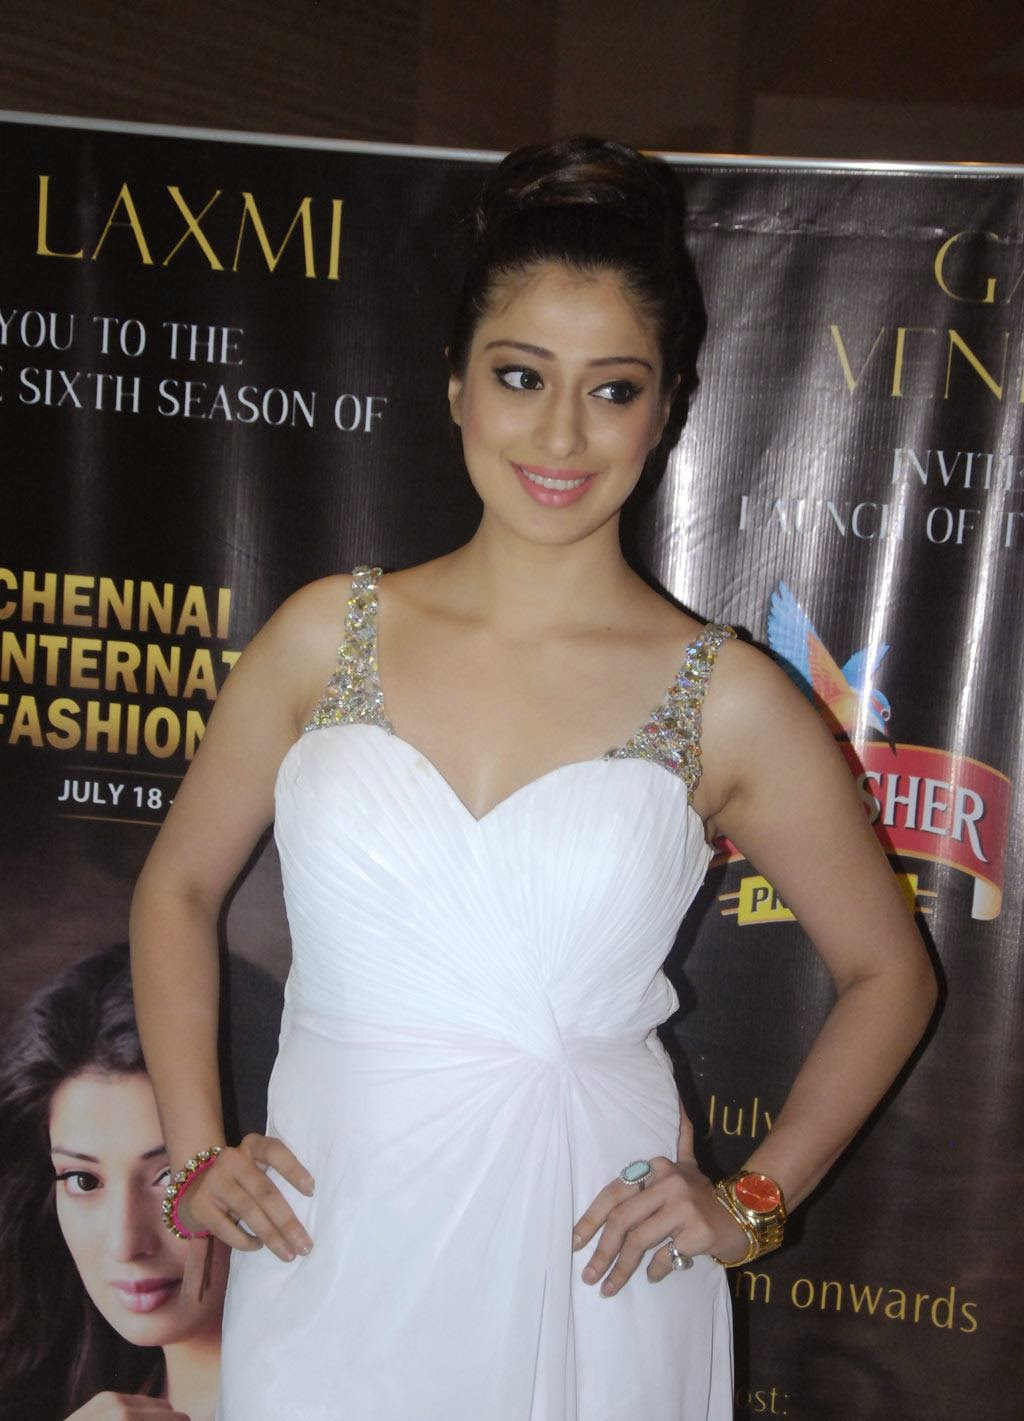 image Actress lakshmi rai cameltoe Part 9